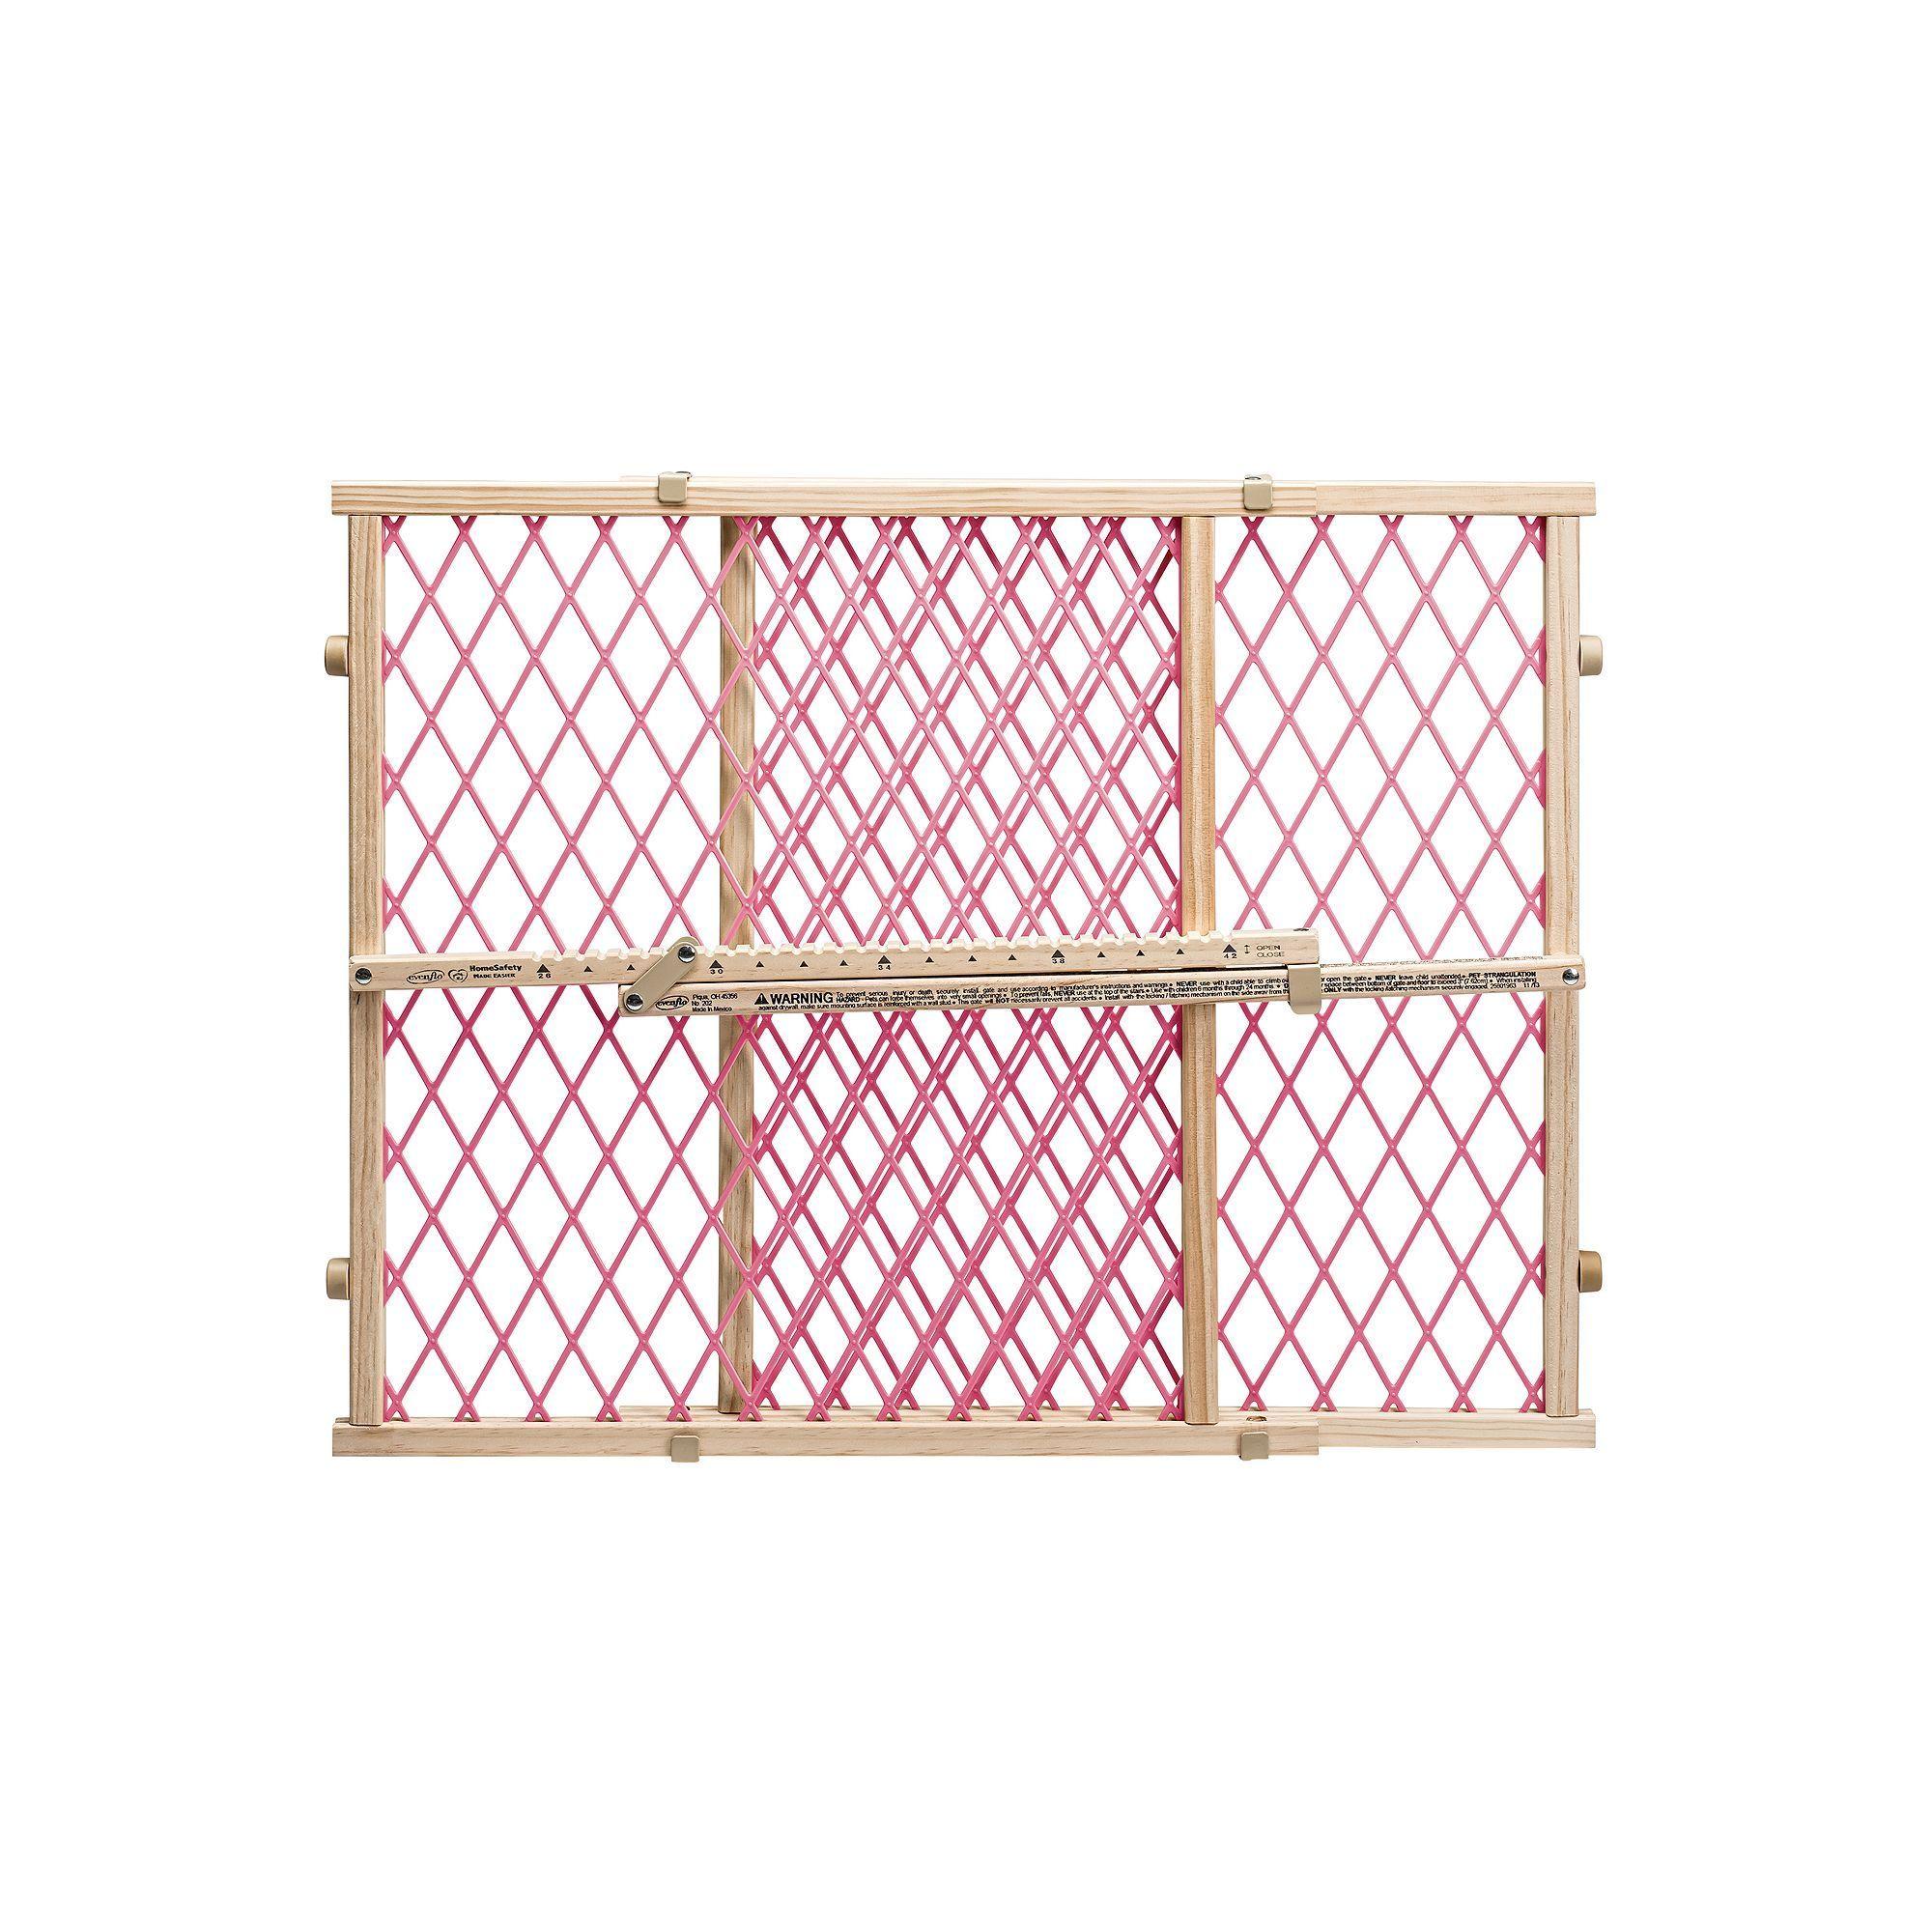 Evenflo Position & Lock Pressure Mount Gate, Pink